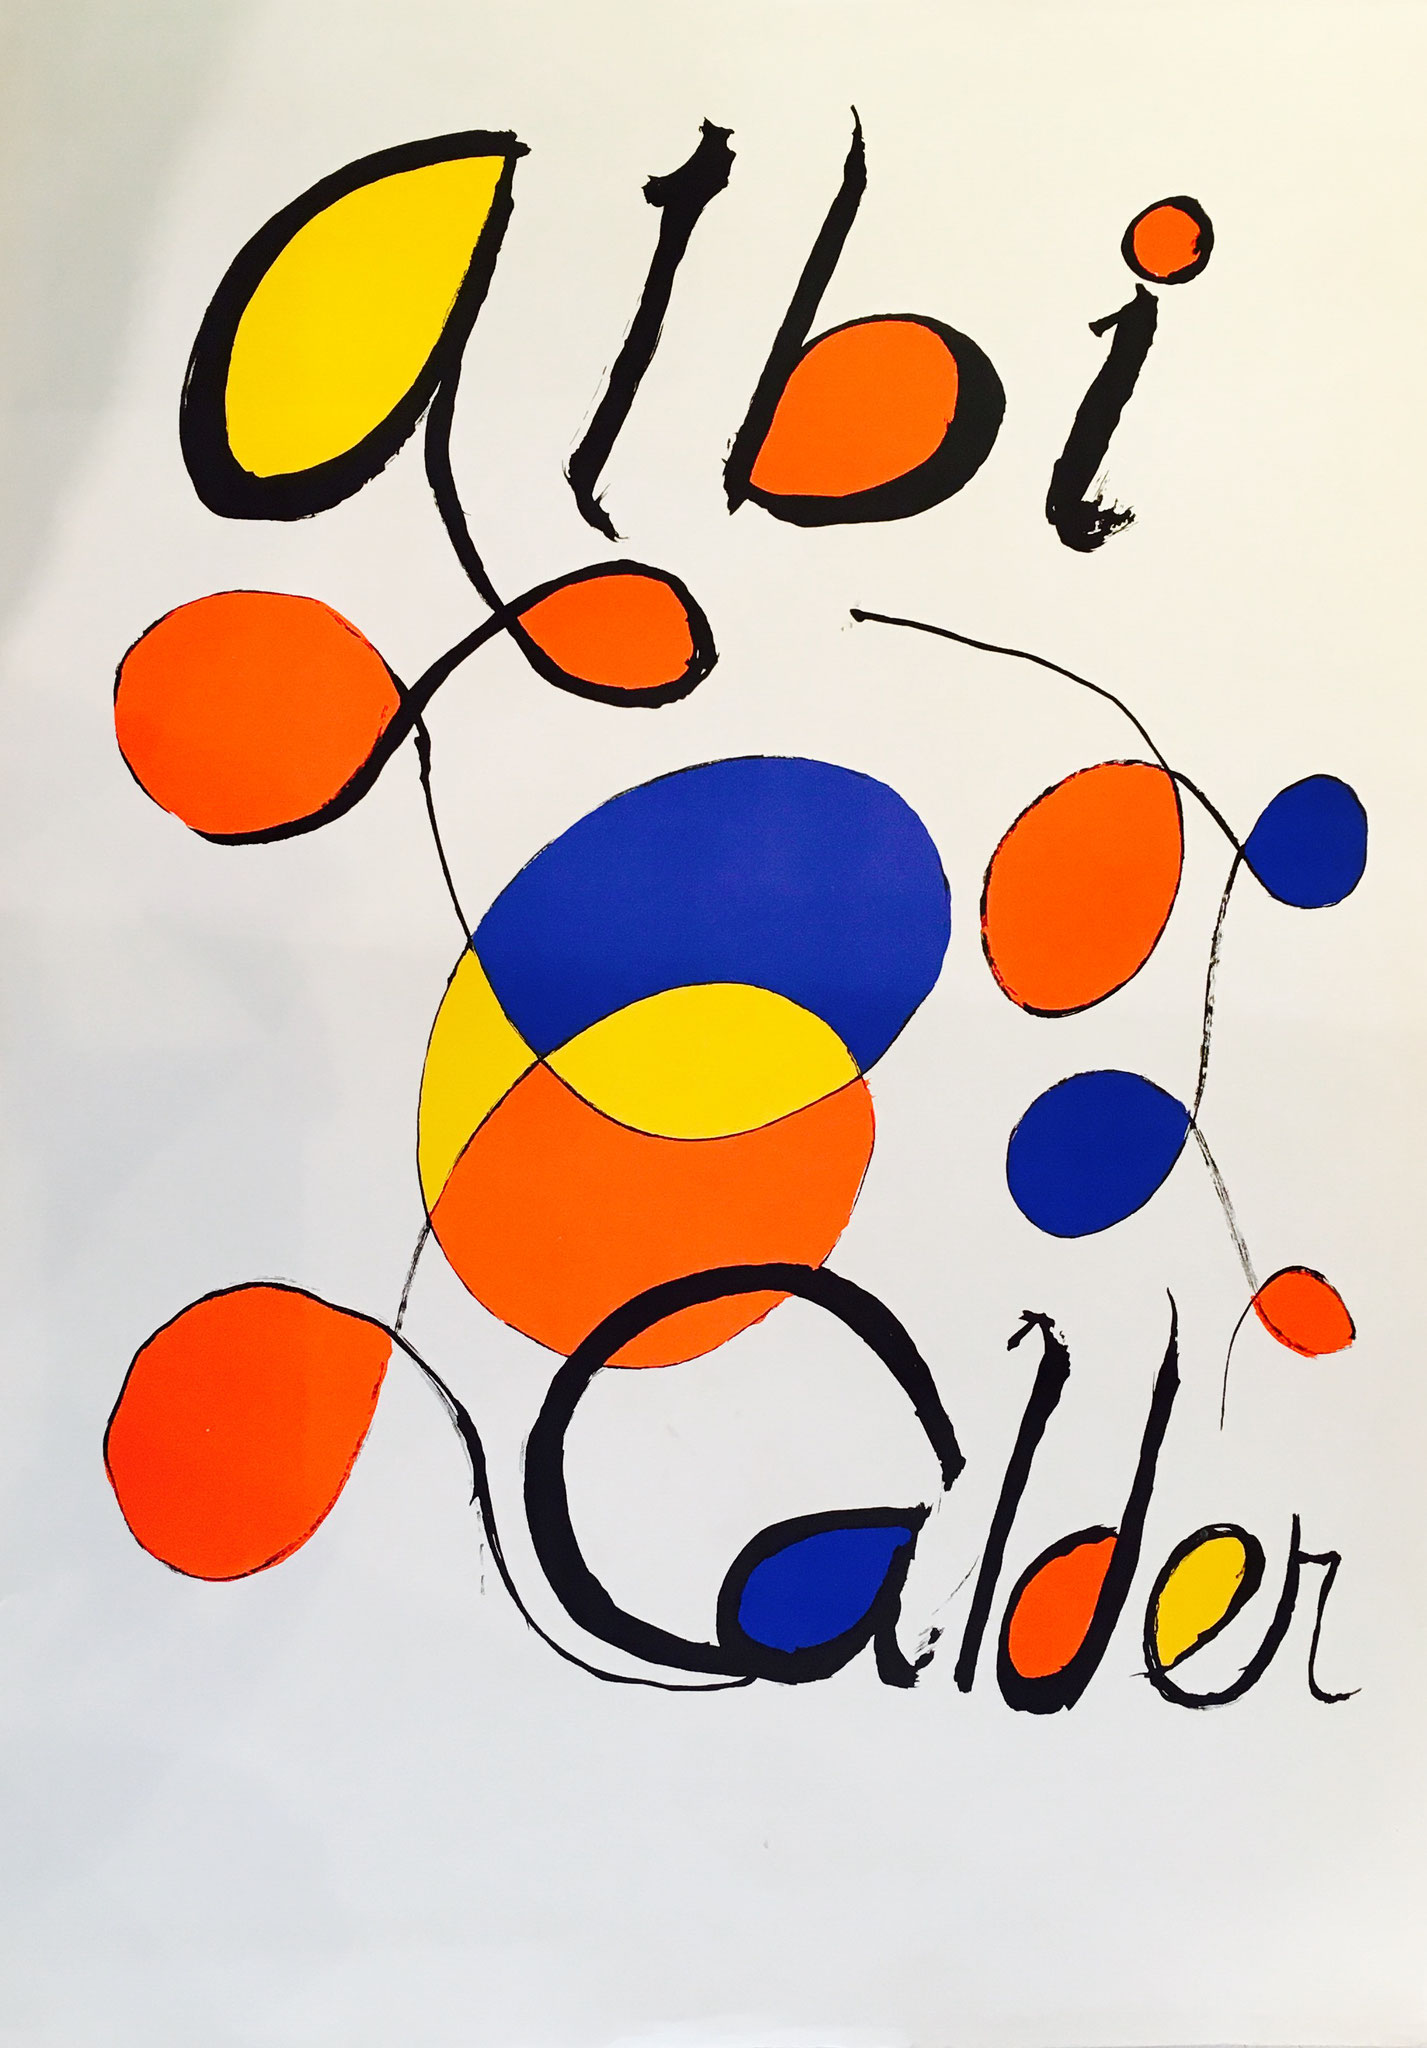 Alexandre CALDER lithographie, 90,5 x 55,5 cm